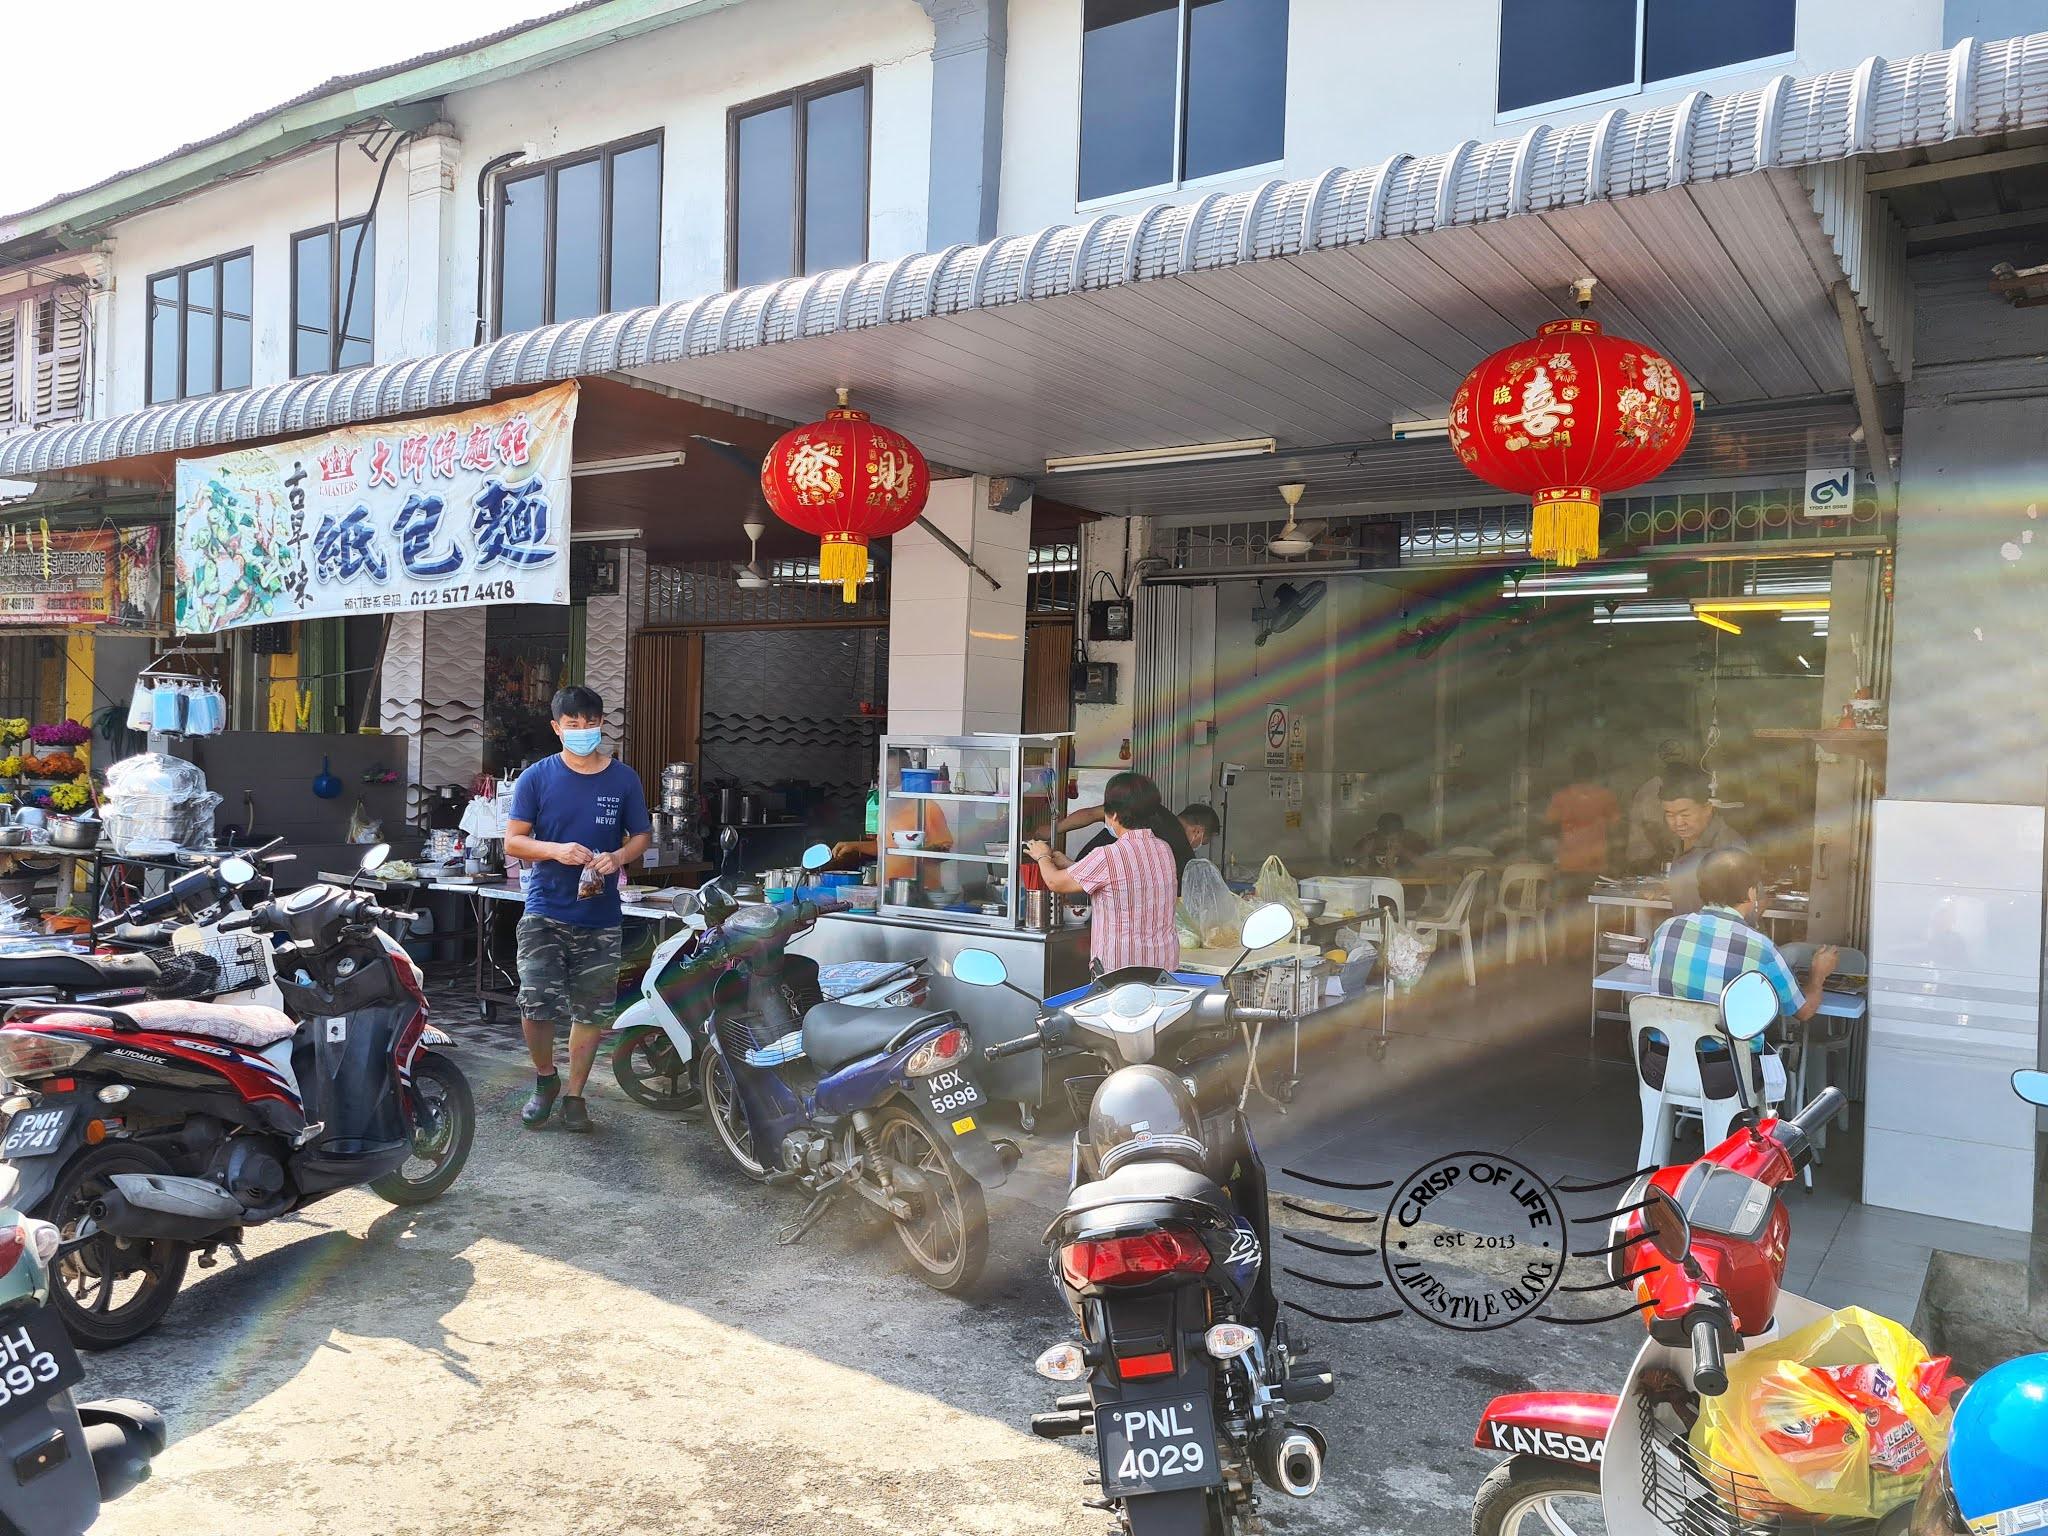 Sungai Lalang Signature Food - Paper Wrapped Noodles 纸包面 @ 琼东茶室 Keng Tong Cafe, Sungai Petani